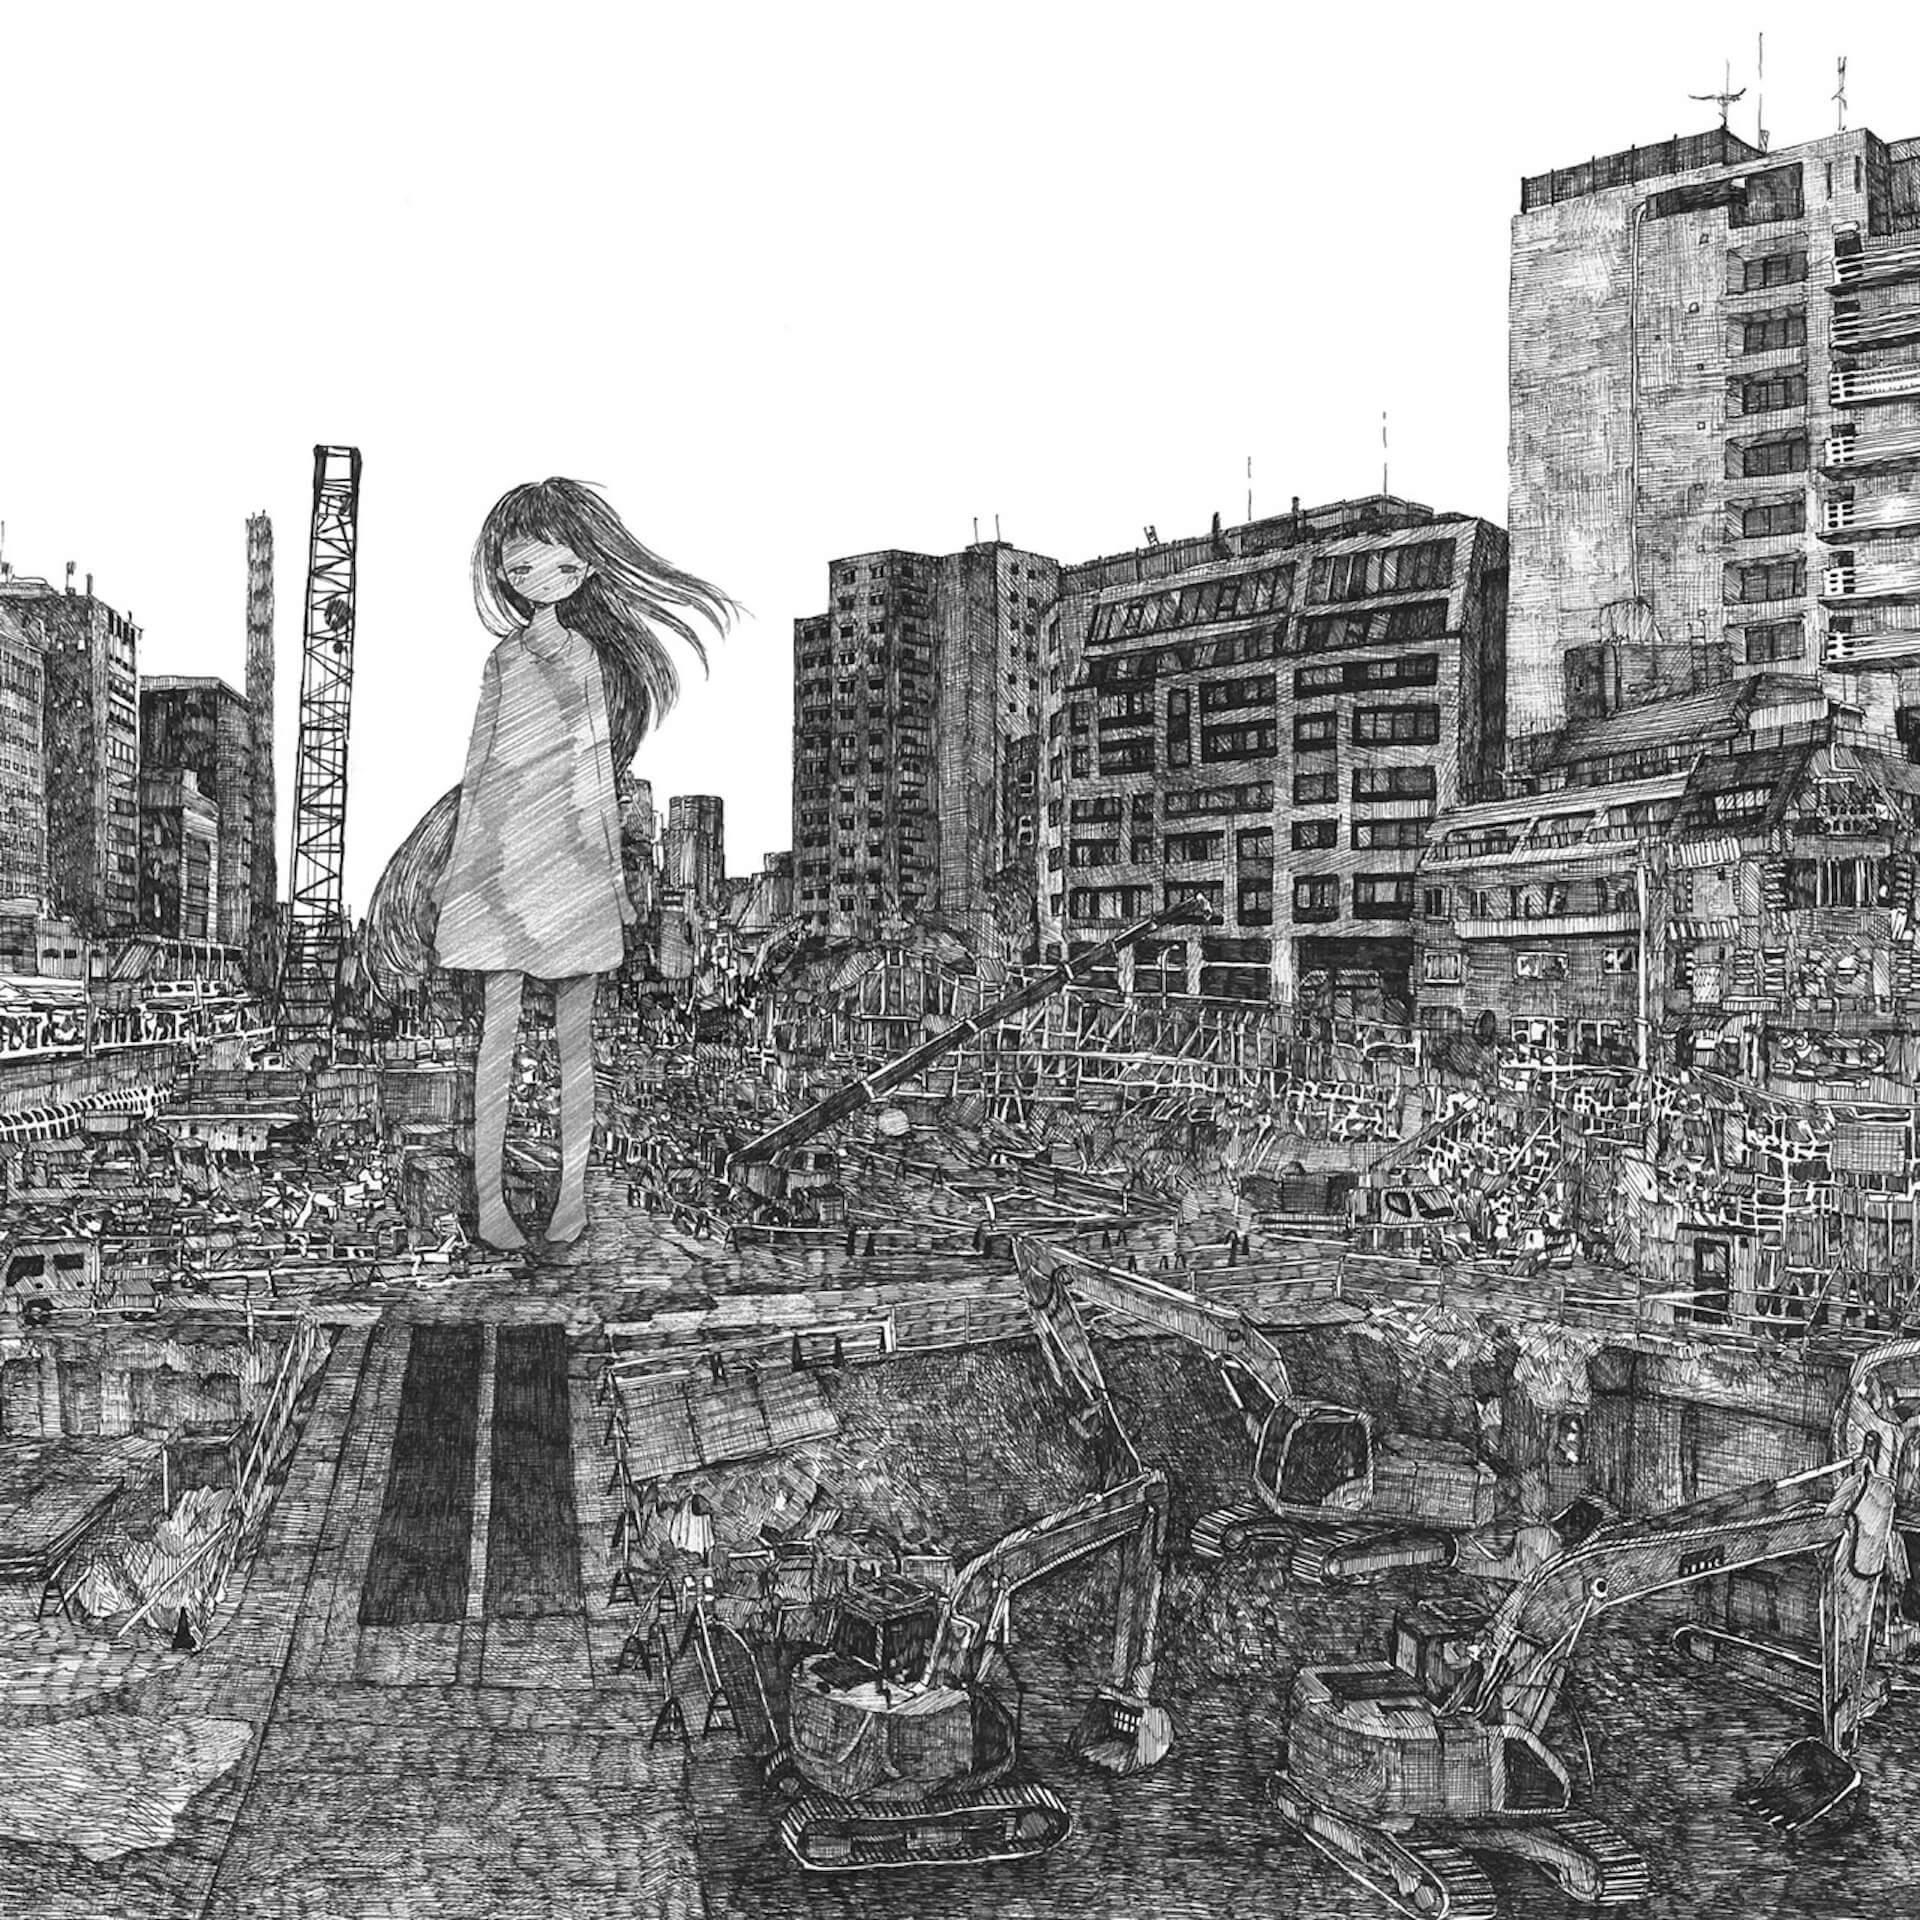 SUPER DOMMUNEにて配信されるDAOKOの4thアルバム『anima』リリース記念ARライブの詳細が公開! music200623_daoko_dommune_02